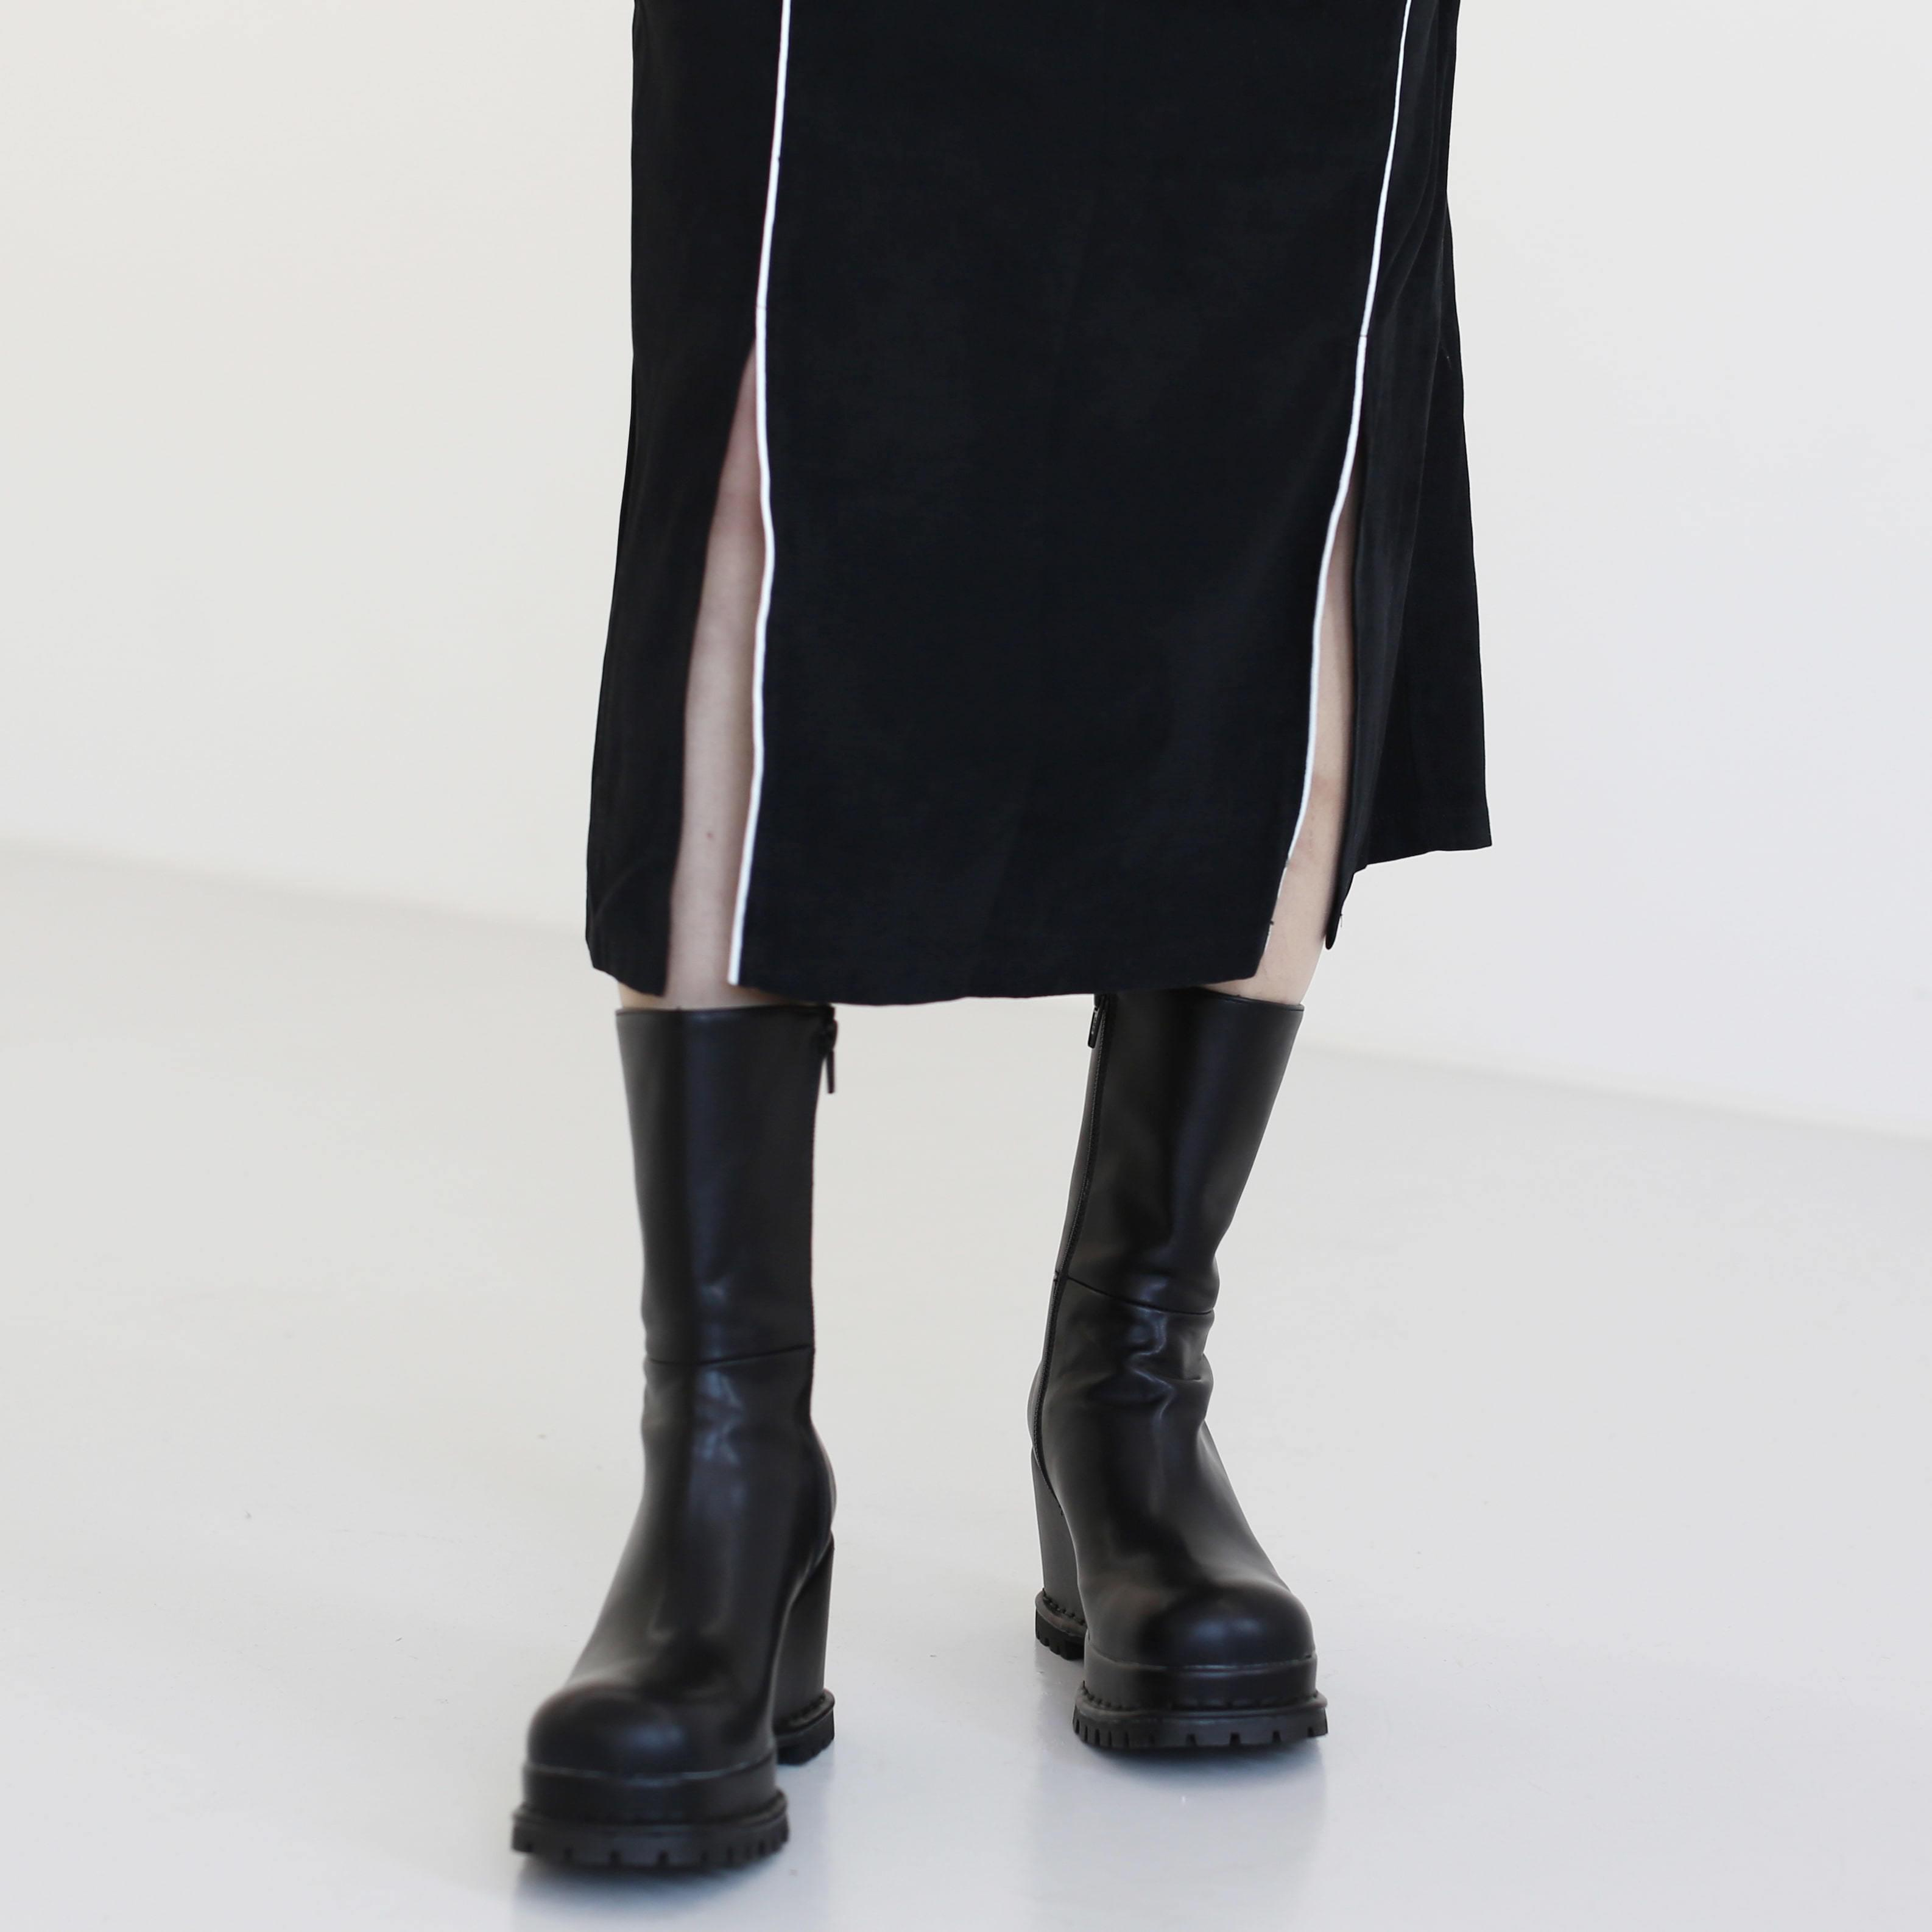 韓國空運 - Stubby wedge half boots 靴子